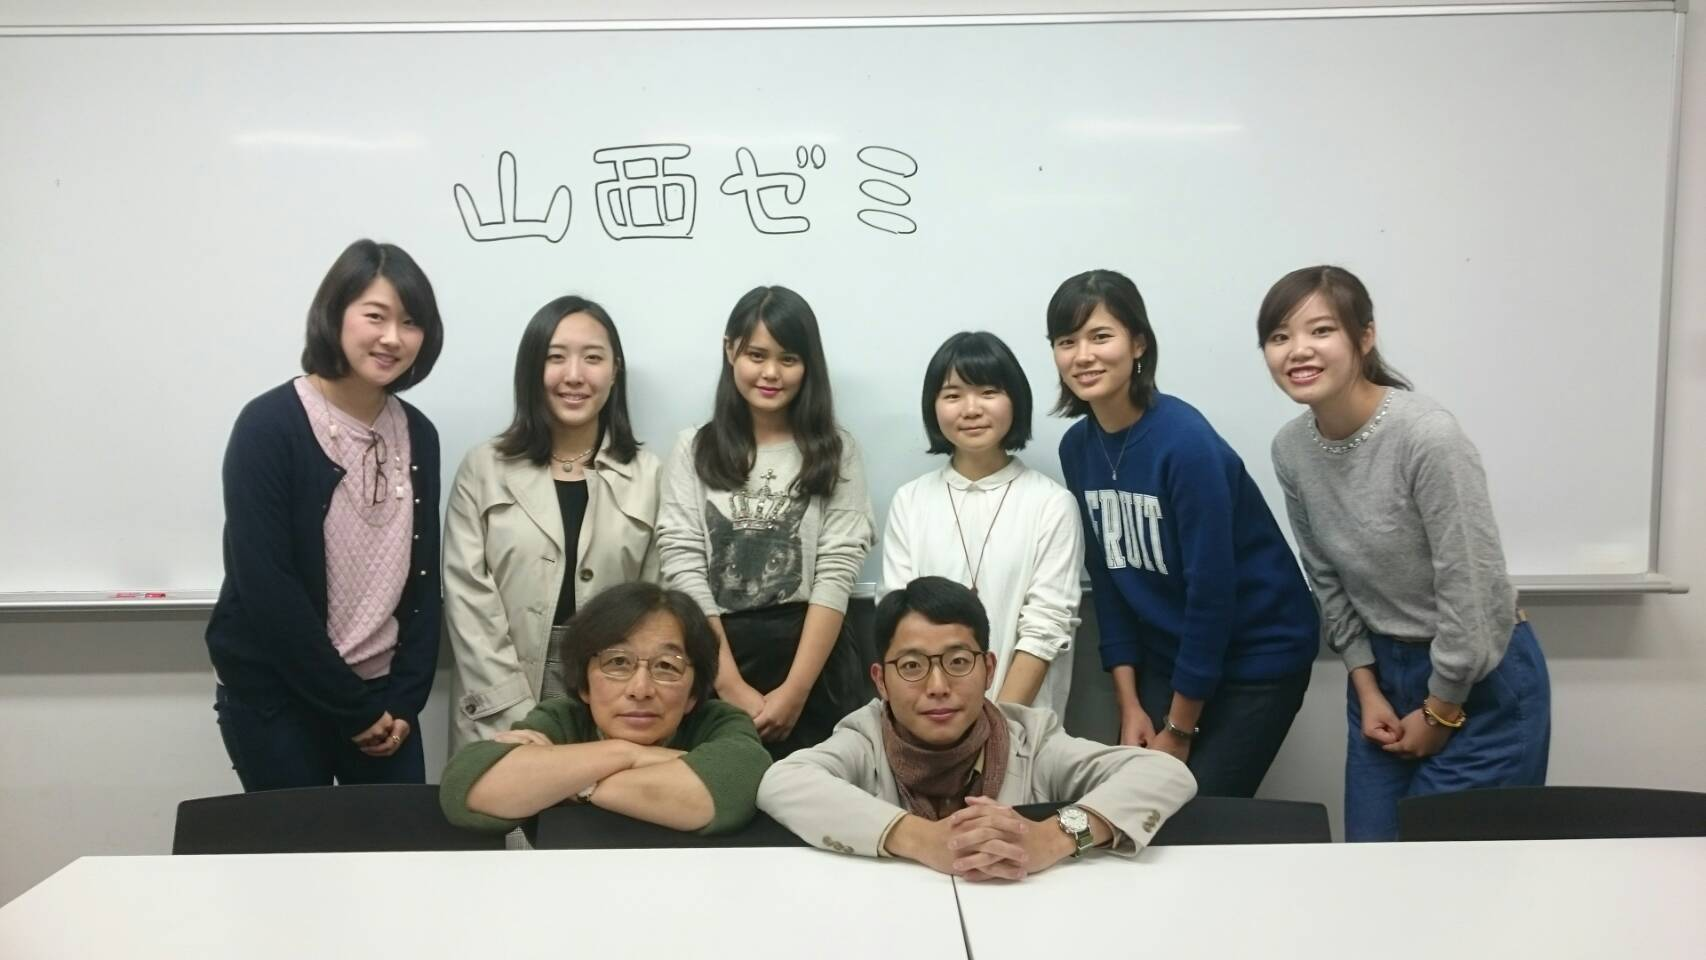 早稲田大学 ゼミ生写真